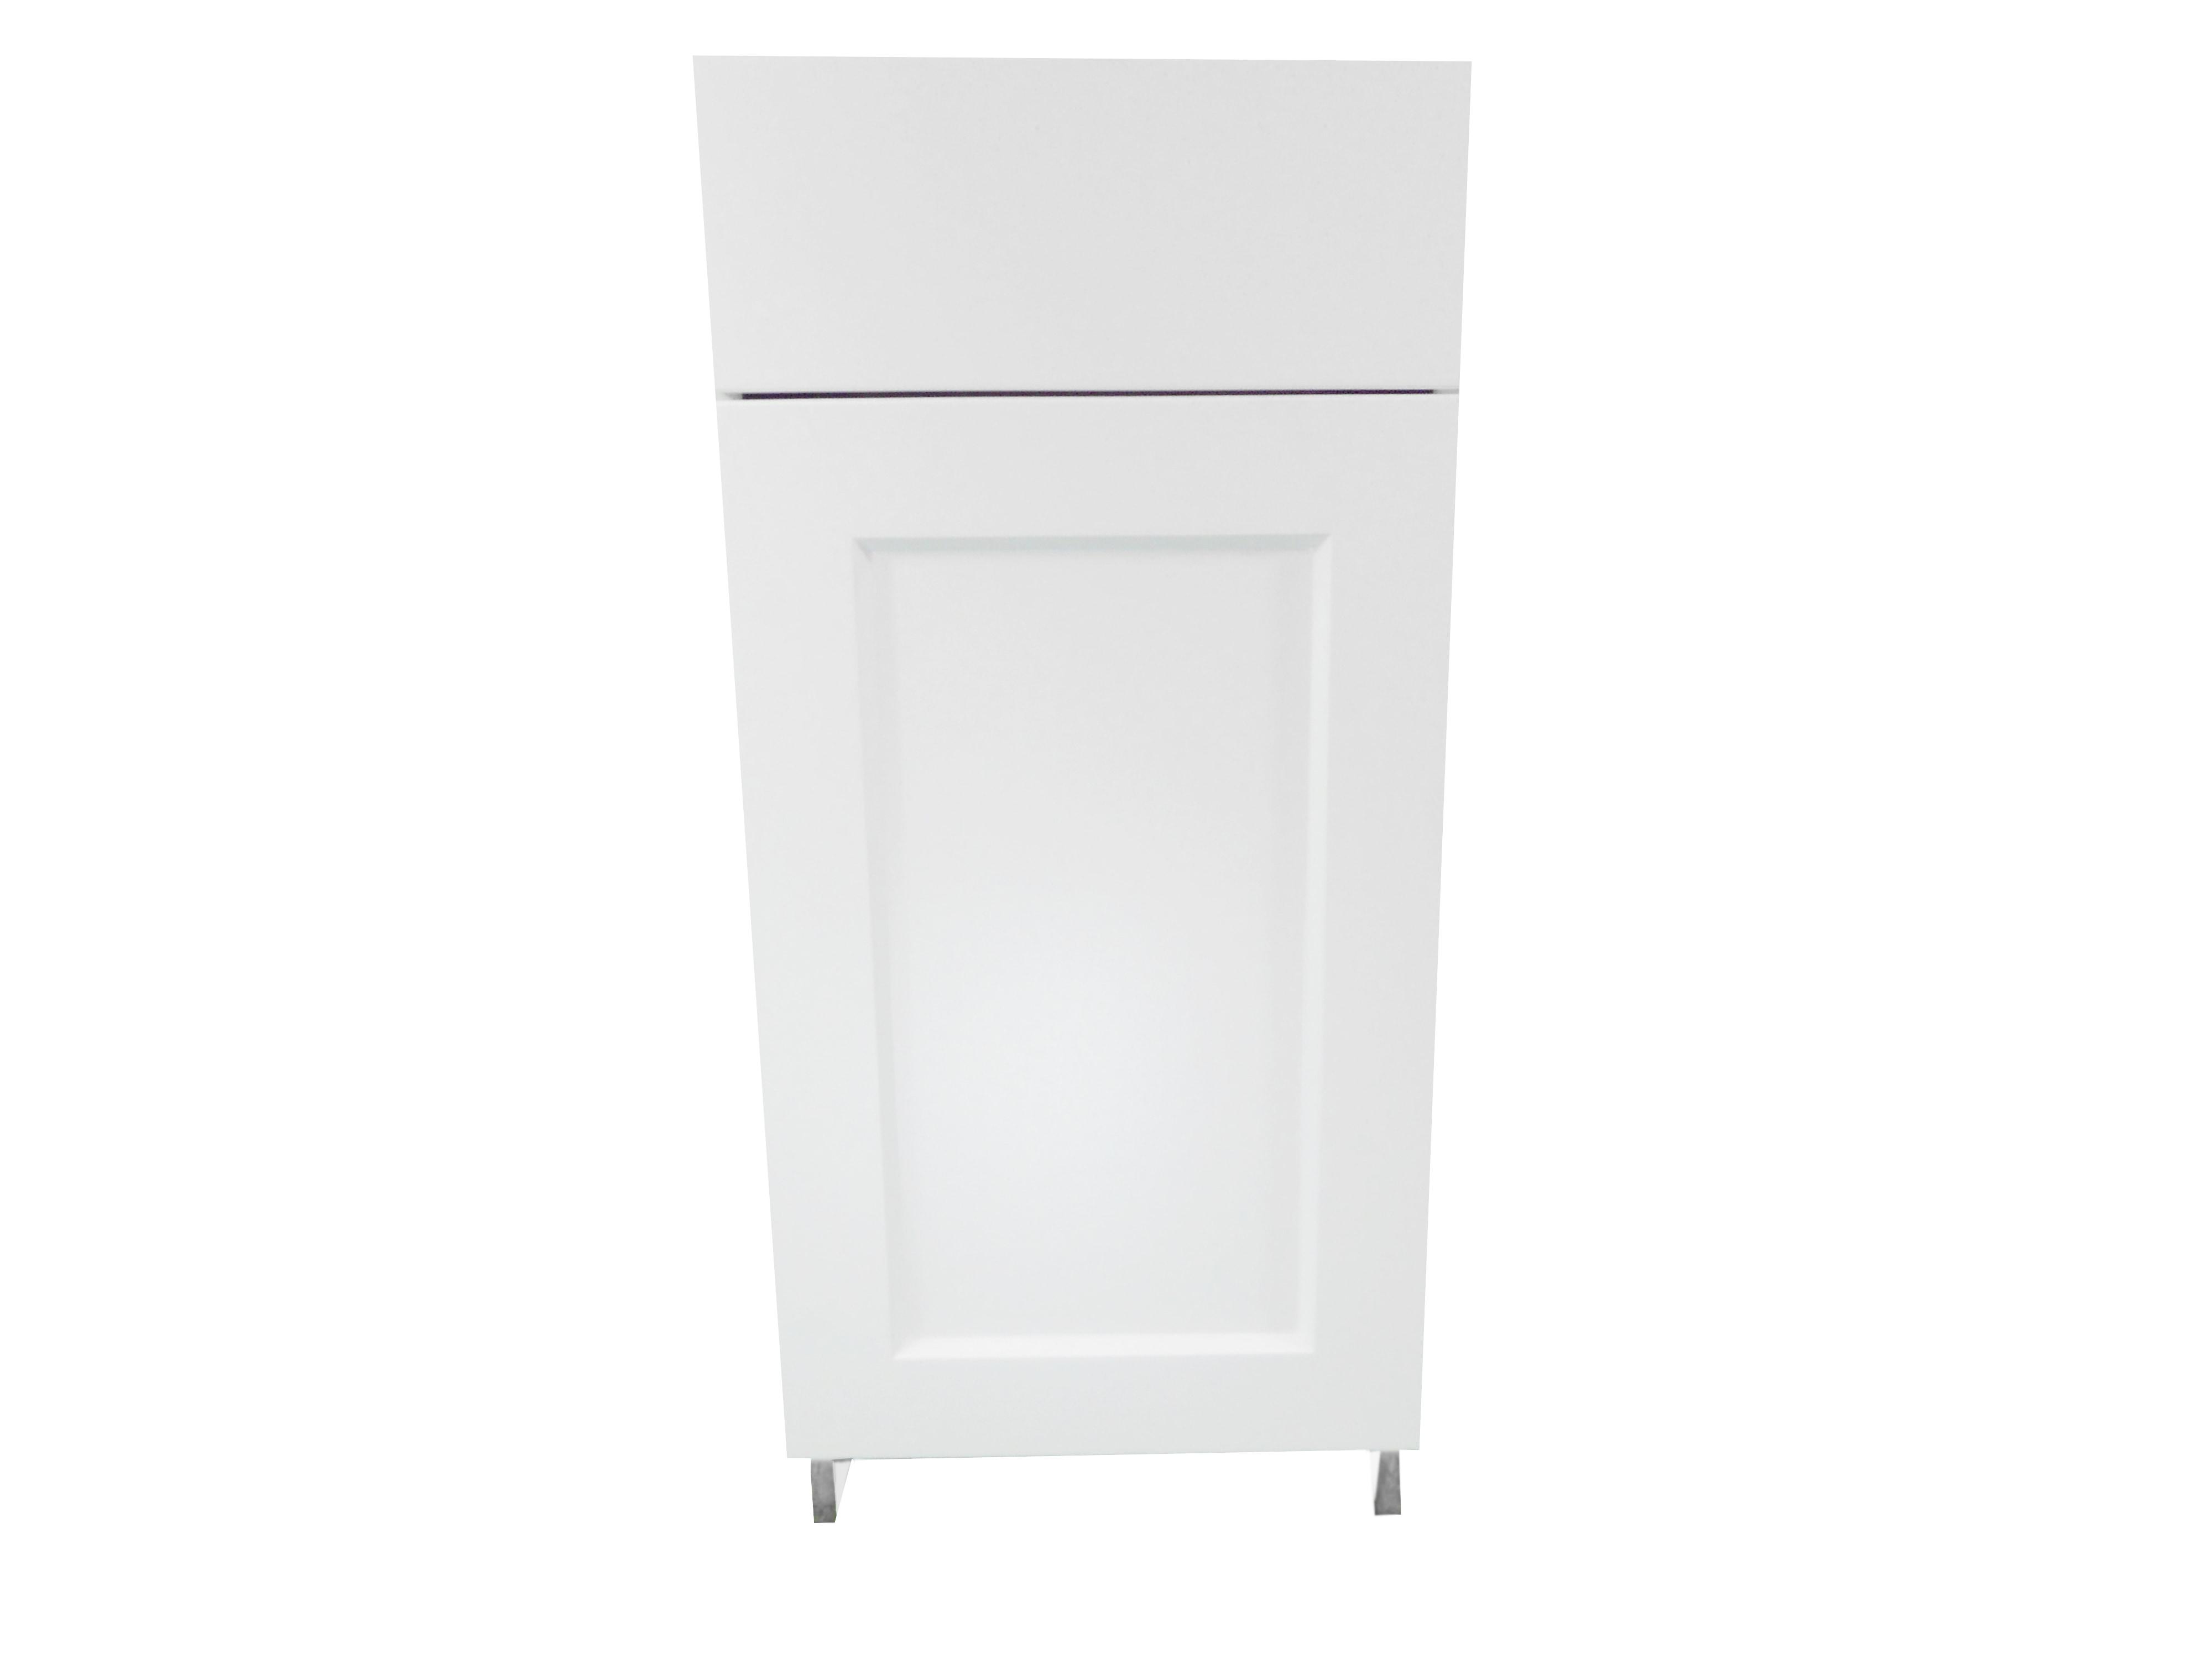 Base Cabinet with Drawer/Door / Wistler White / Flat Panel White / 15 Whistler White 0